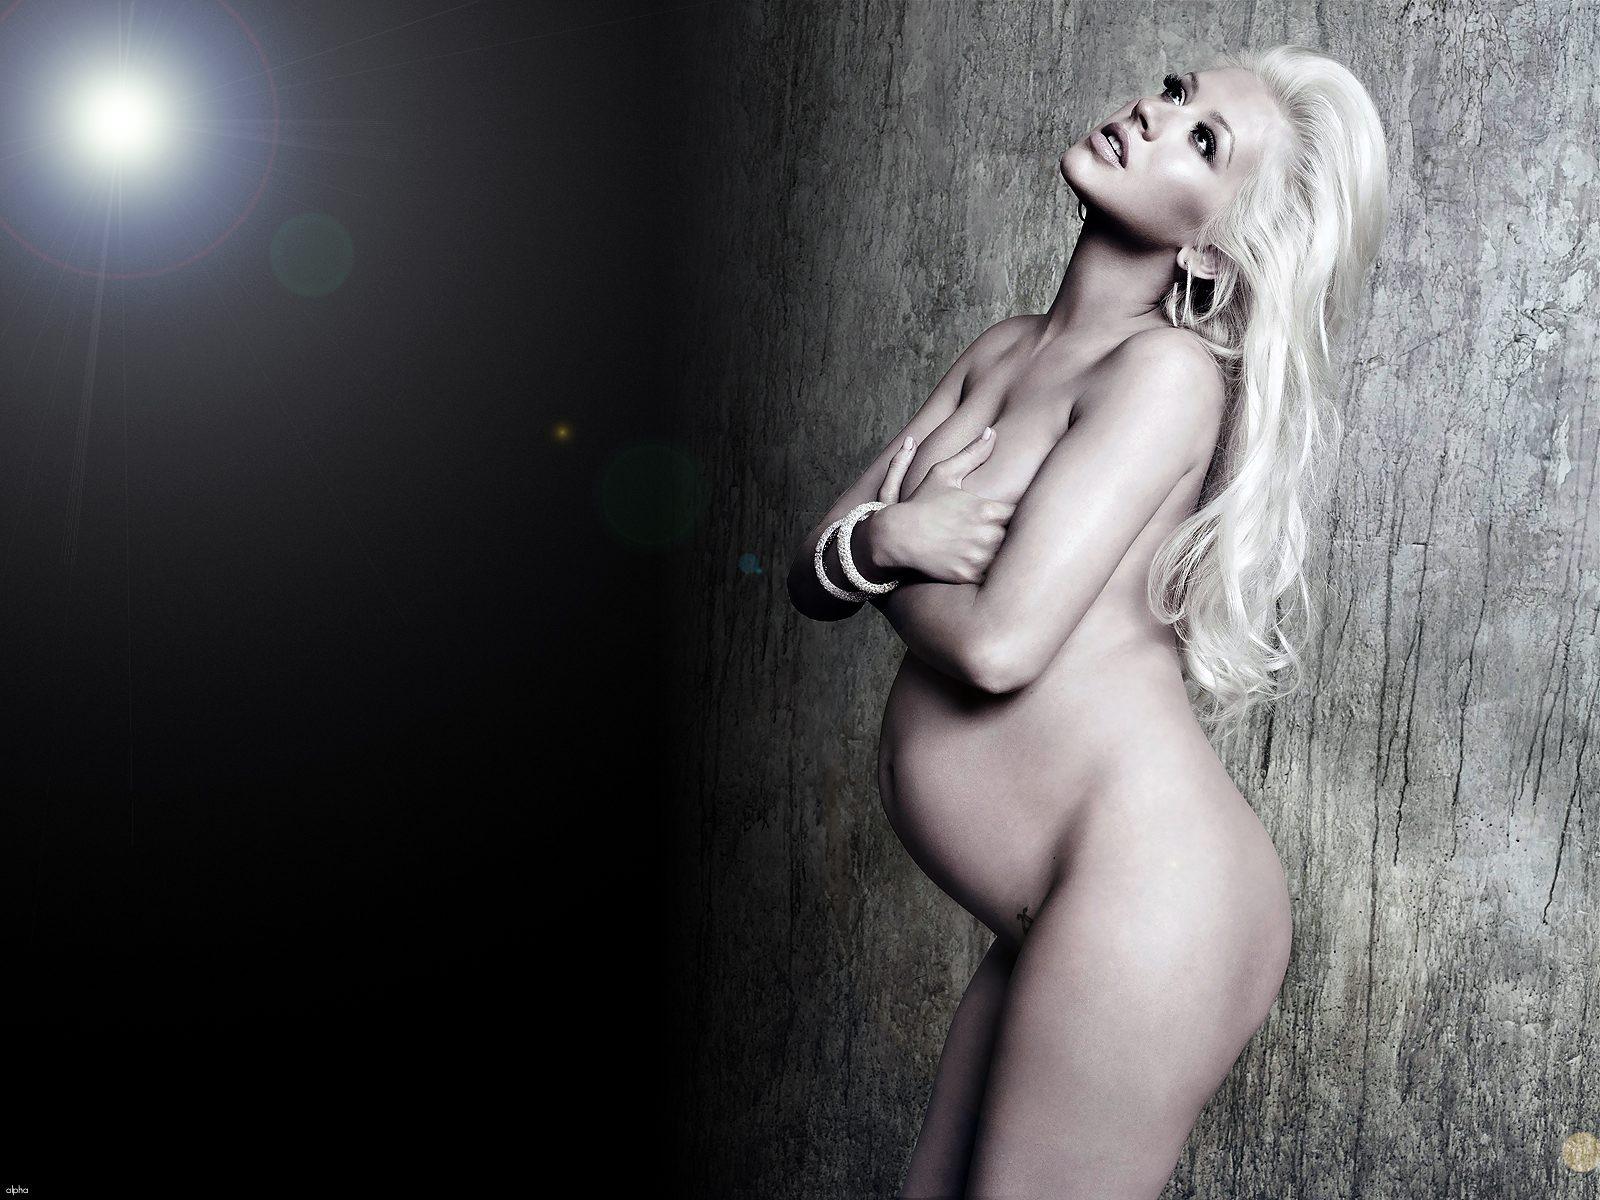 Christina aguilera naked pregnant sorry, that